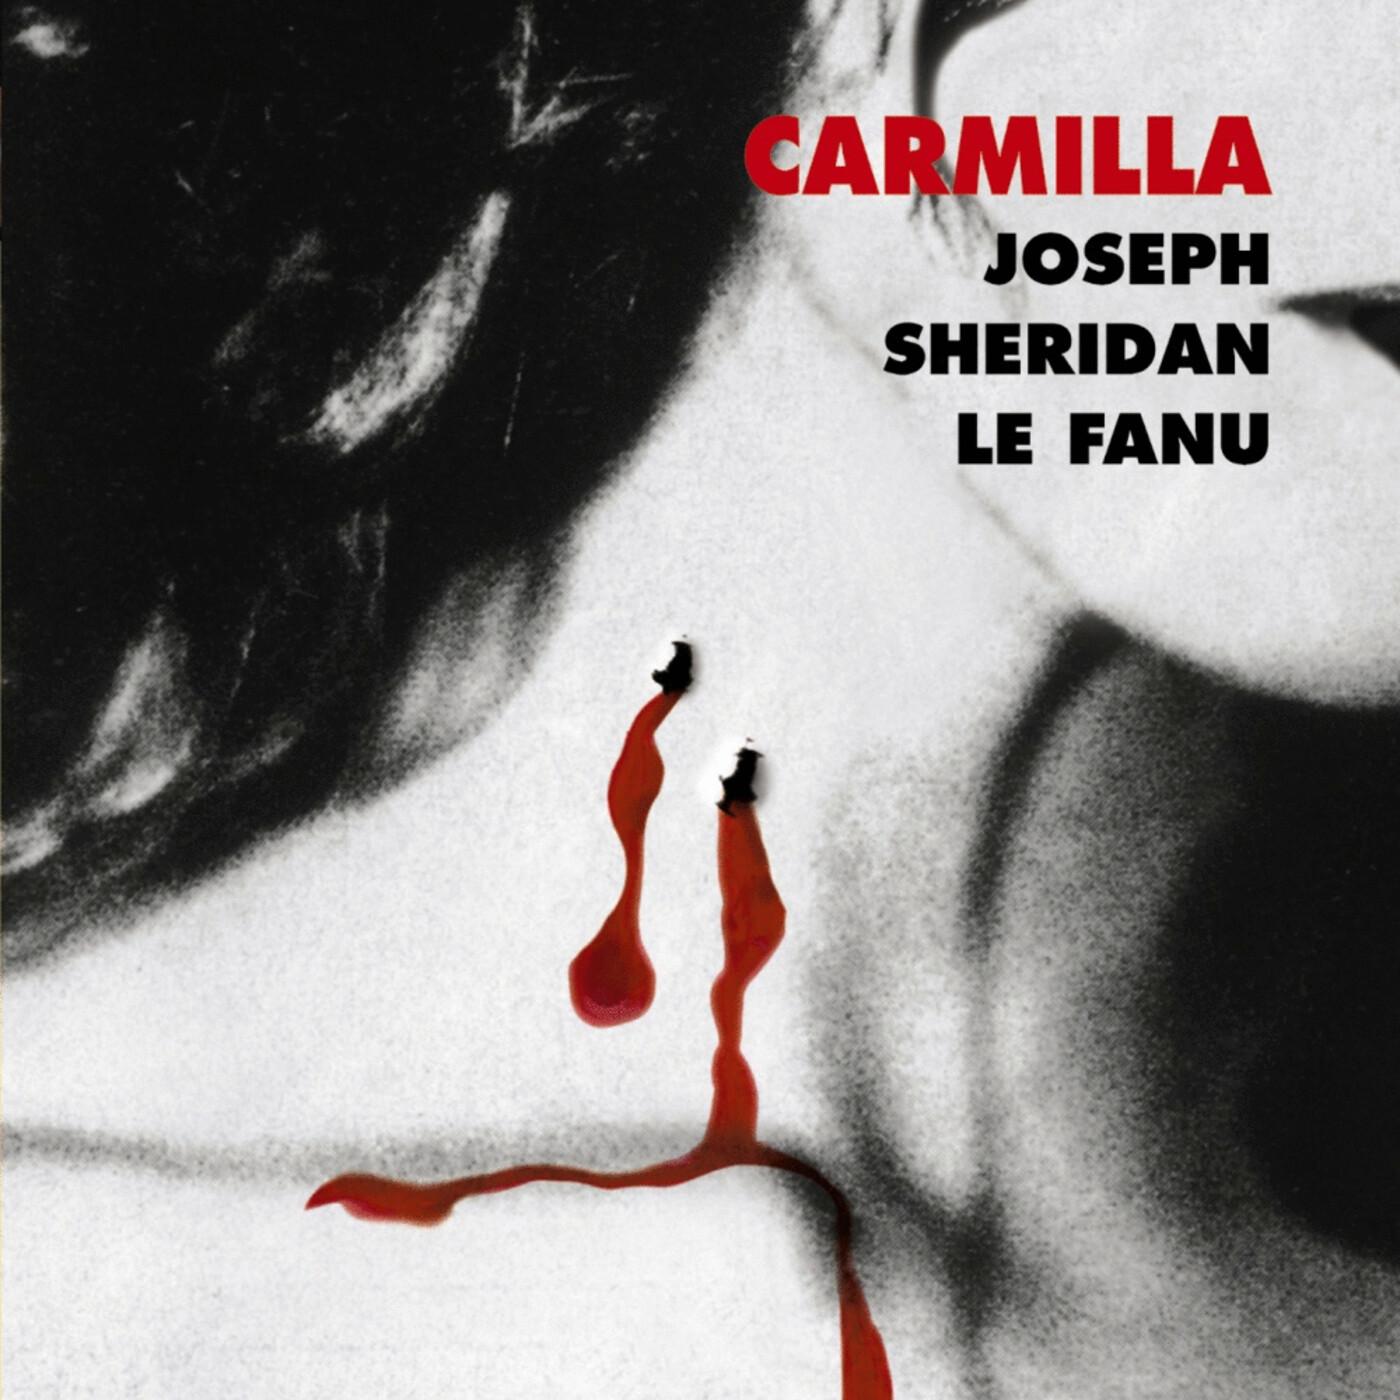 AVANCE - AUDIOLIBRO - Carmilla by Joseph Sheridan Le Fanu